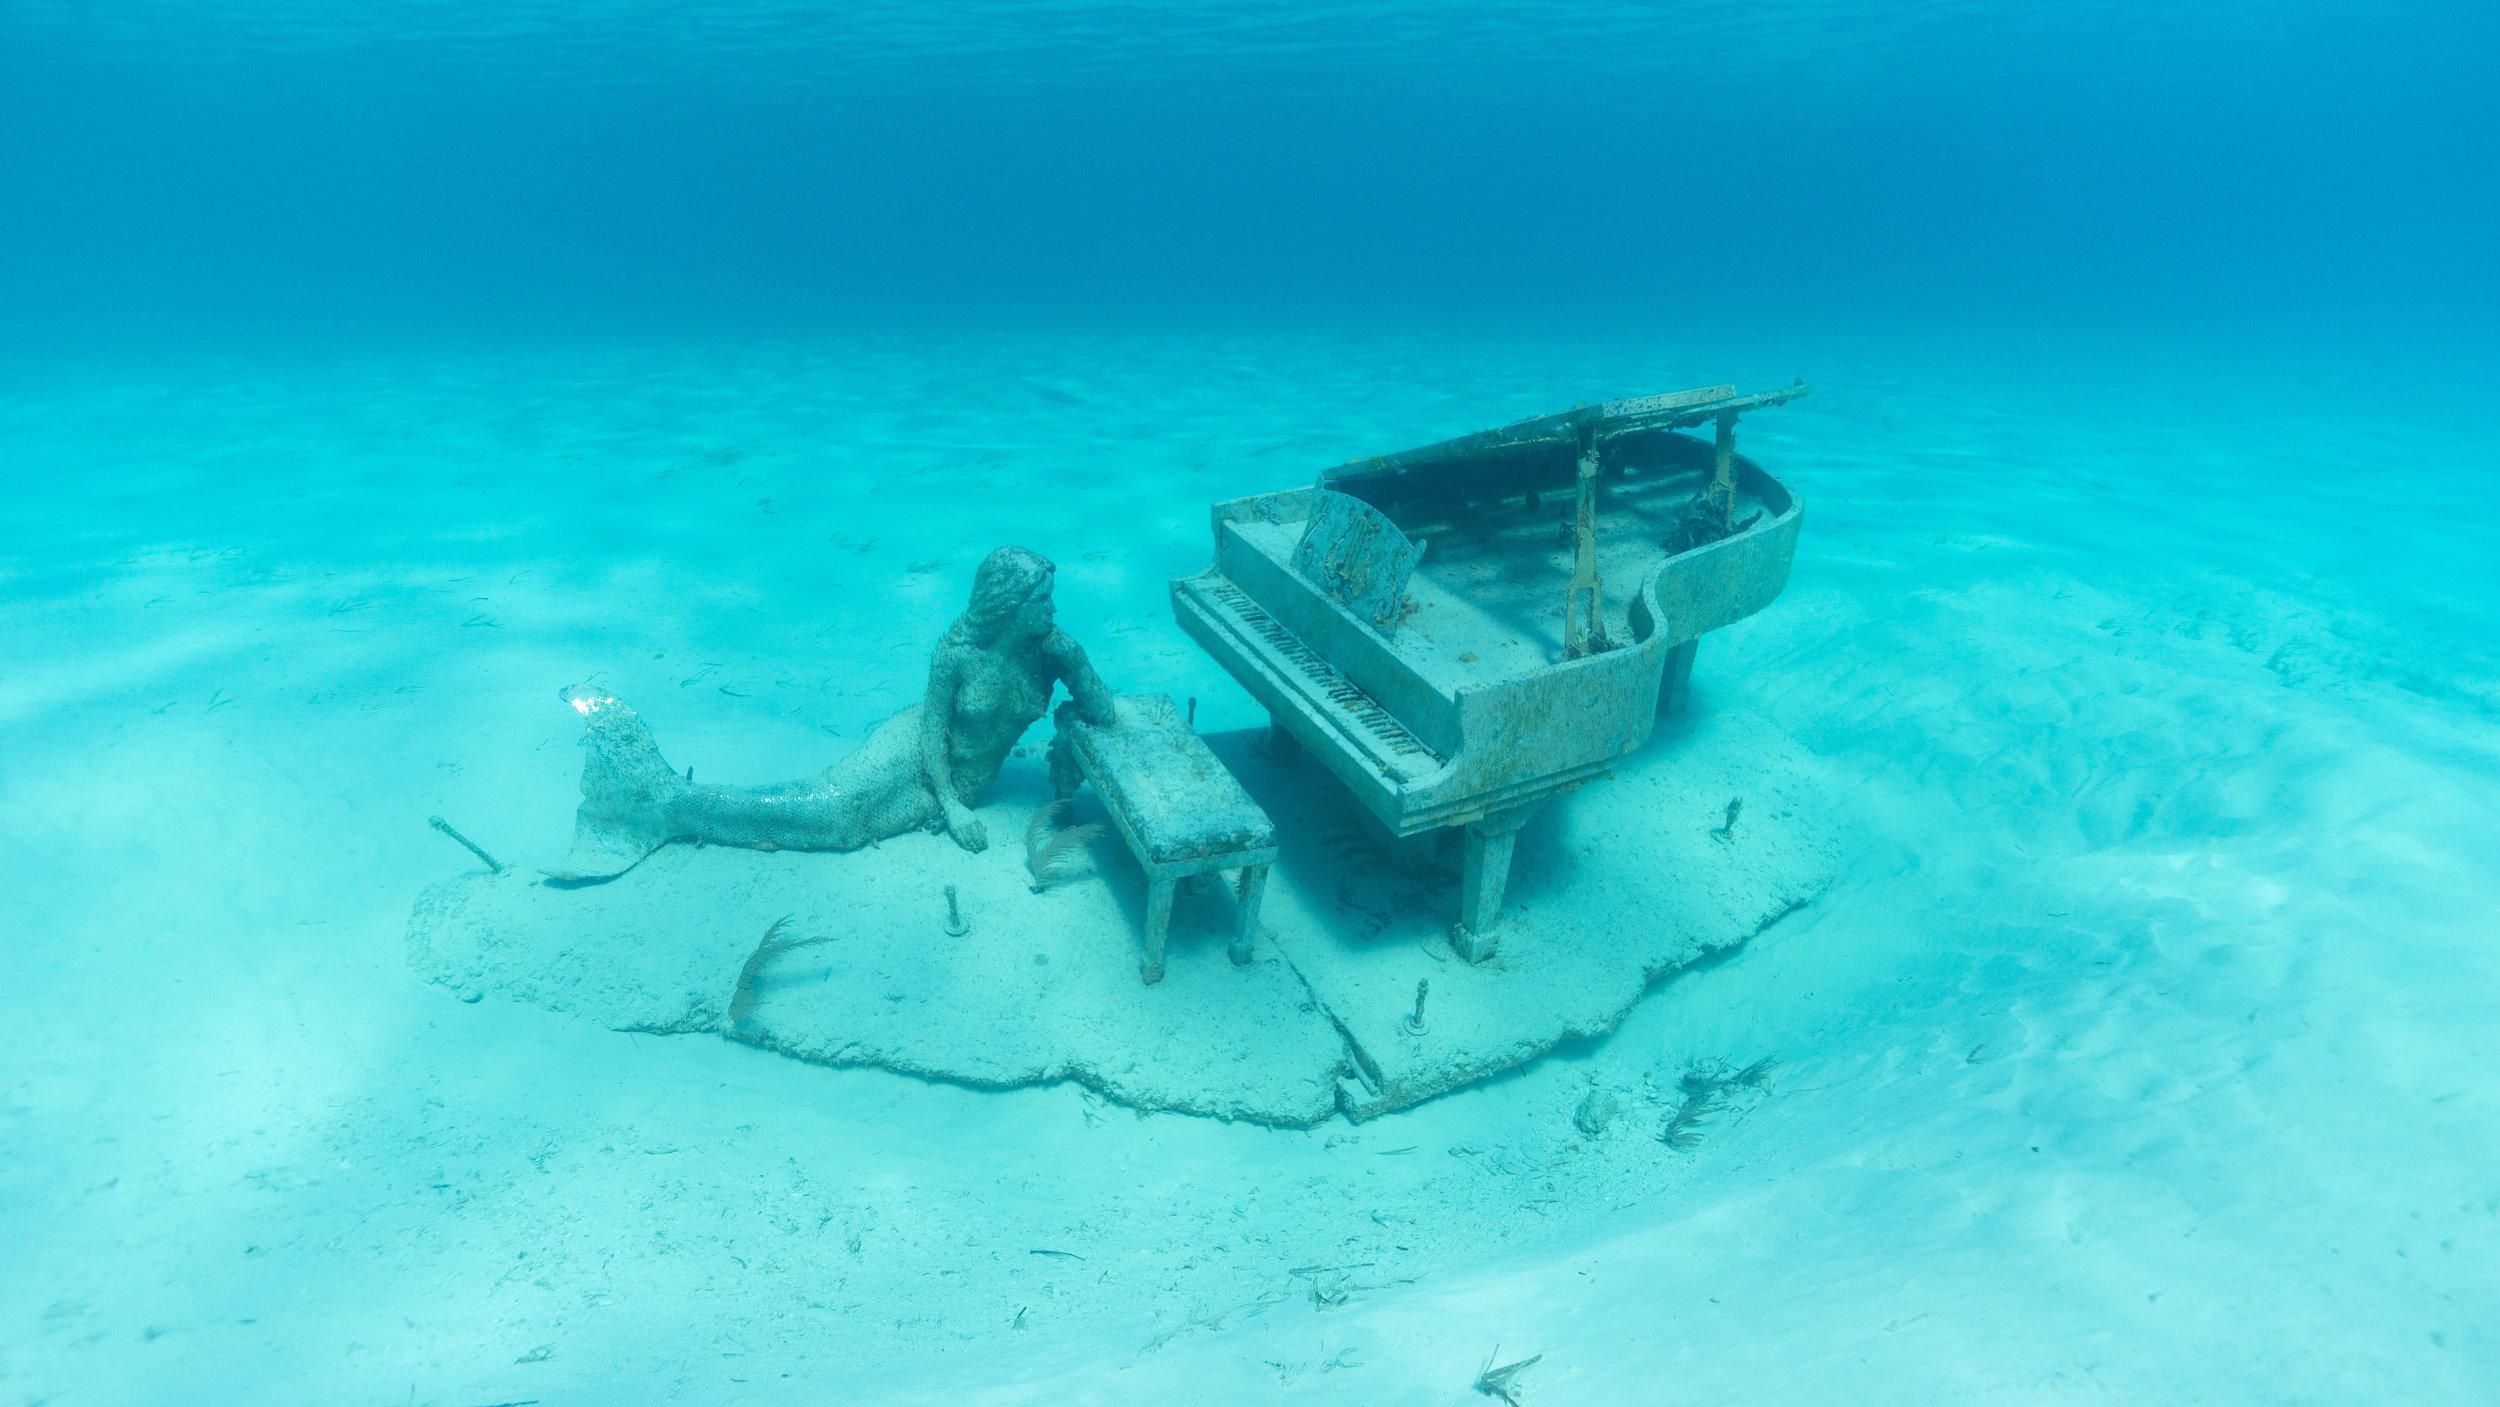 jason-decaires-taylor-Atlas-Yacht-sweet-escape-charter-dive-snorkle-activities-destinations-bahamas-luxury-eco-tourism-mdermaid-copperfield-rudder-cut-cay